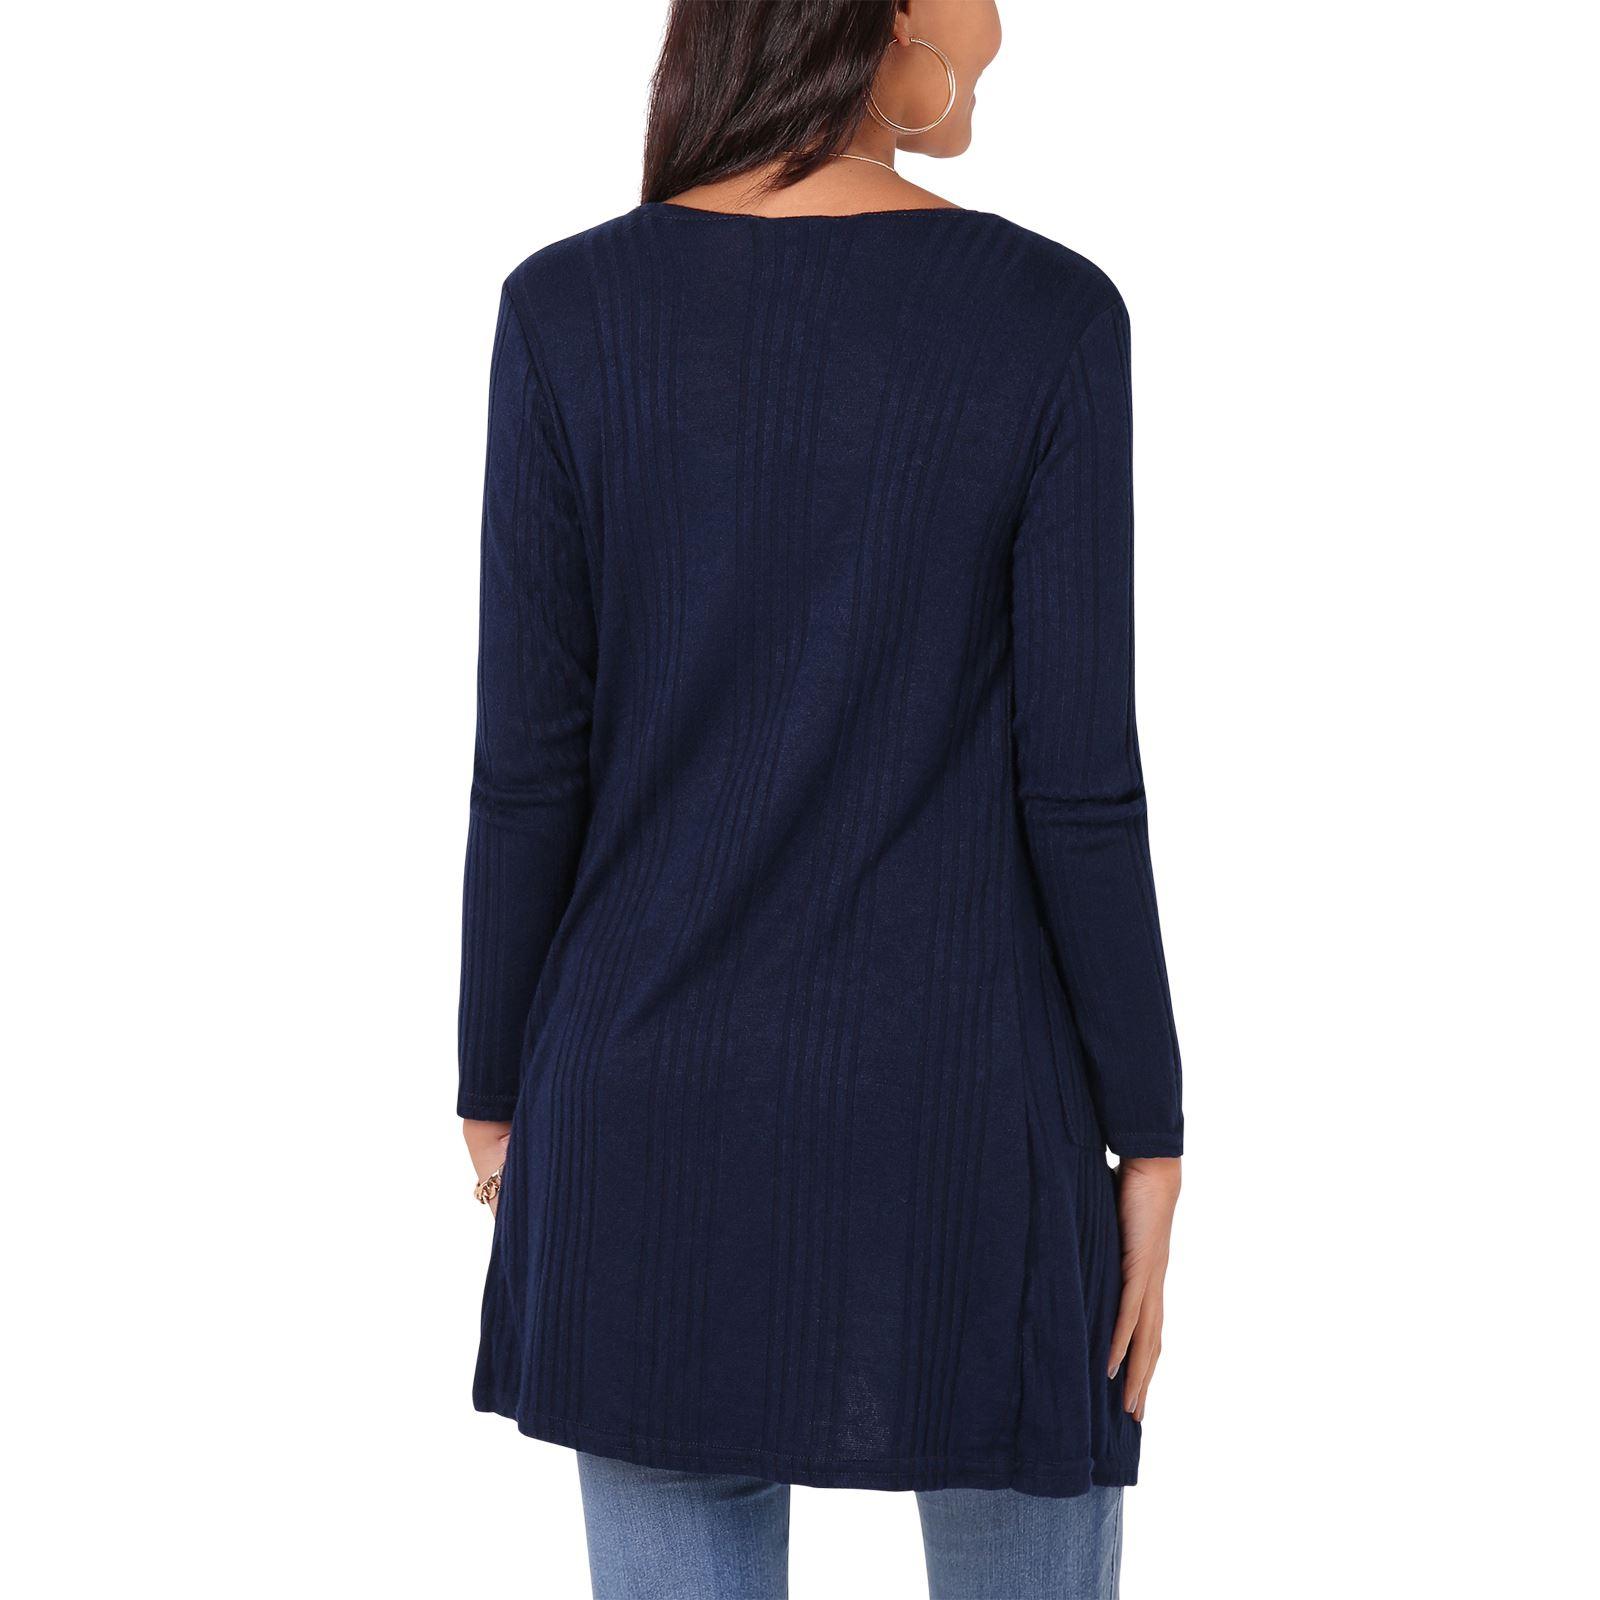 Womens-Ladies-Jersey-Long-Sleeve-Cardigan-Open-Blazer-Pockets-Plain-Basic-Top